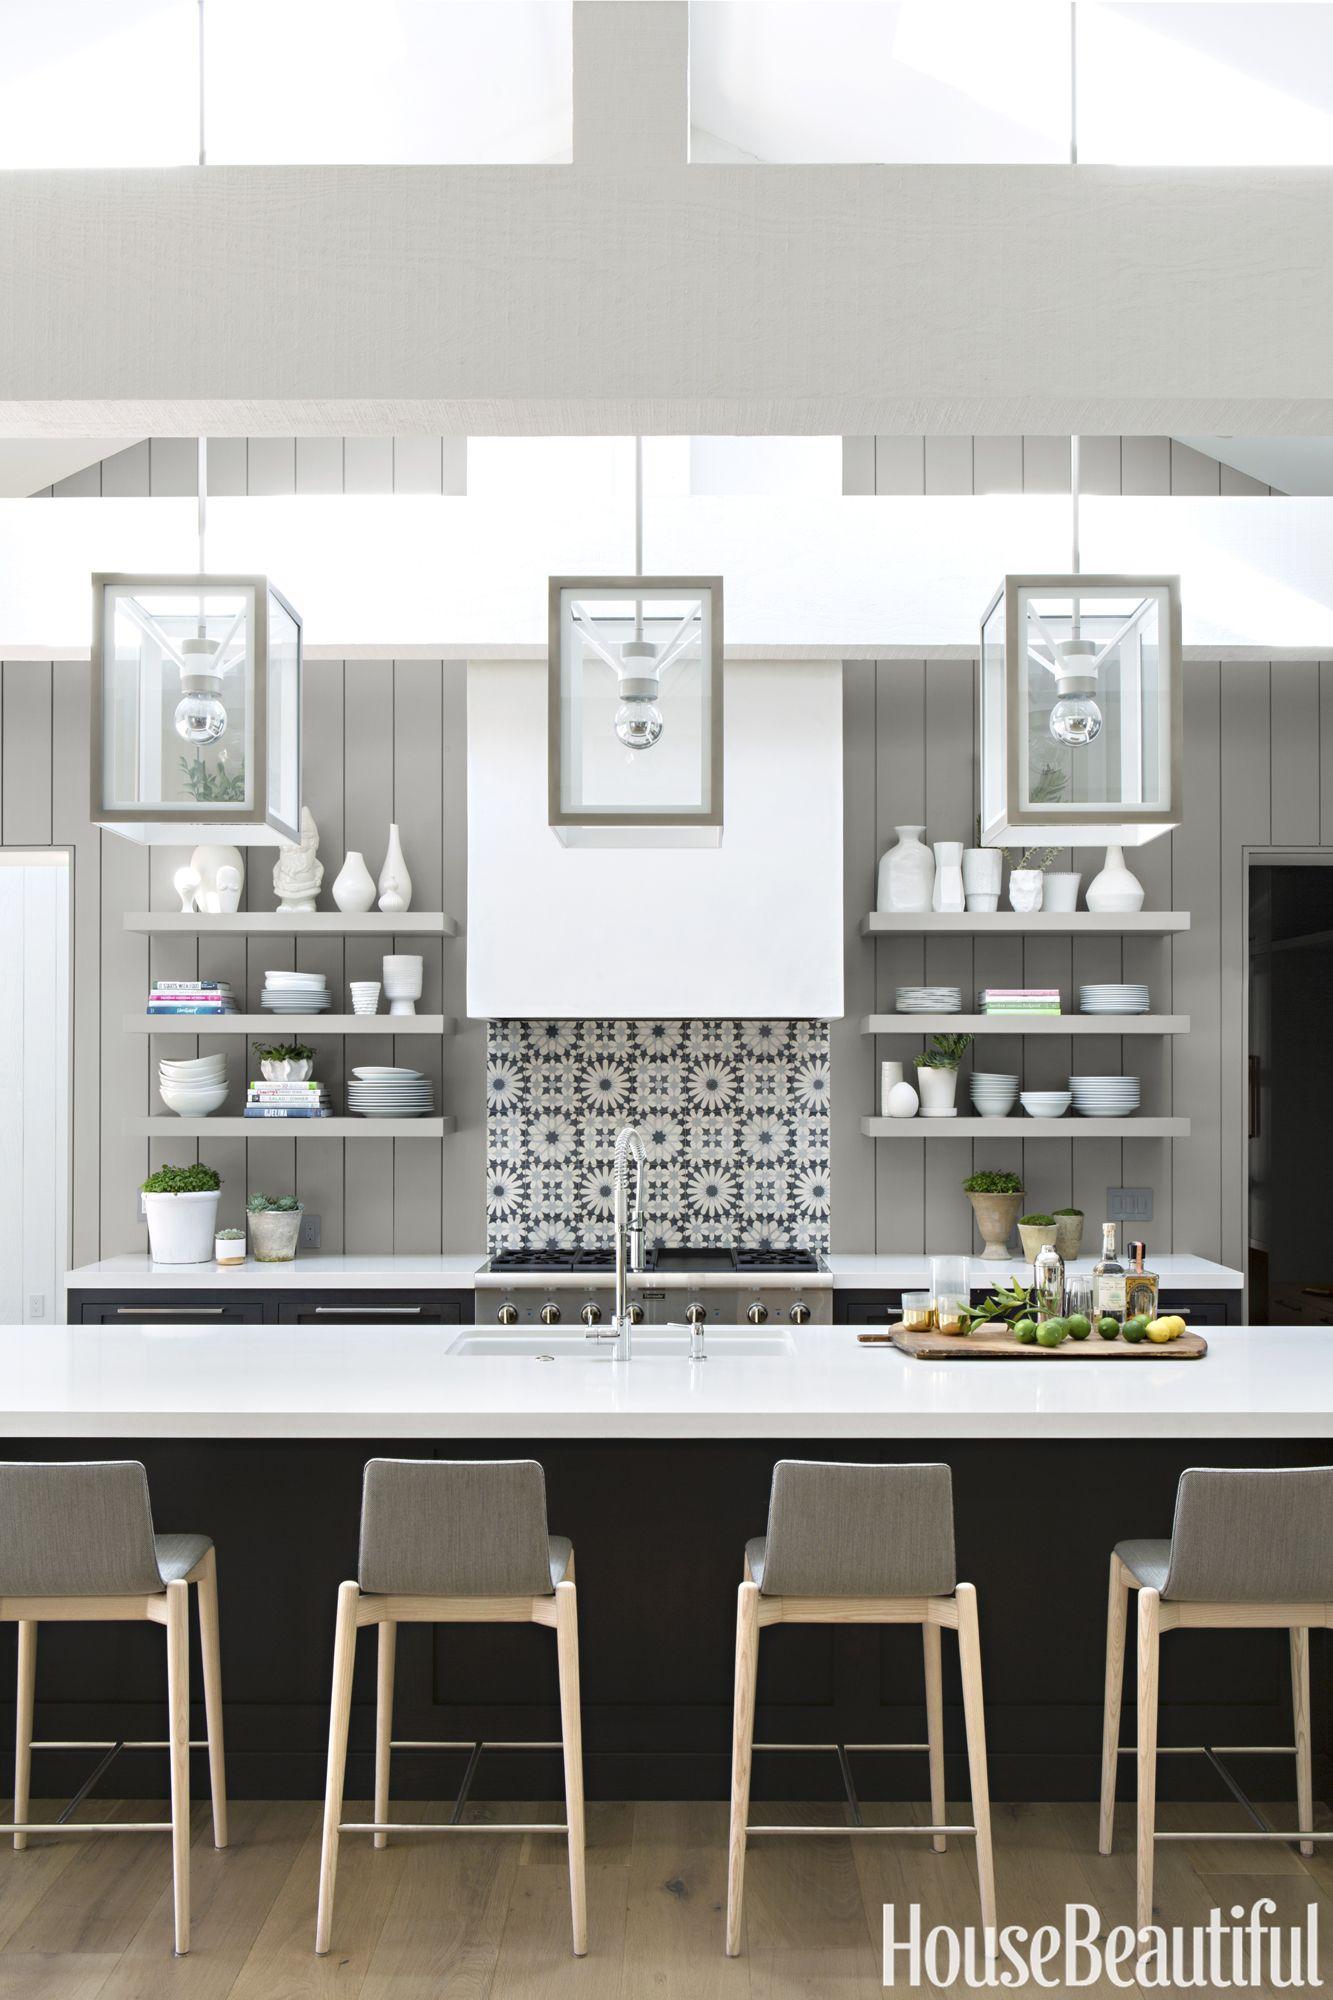 30 Best Kitchen Countertops Design Ideas - Types of ... on Kitchen Counter Decor Modern  id=64294